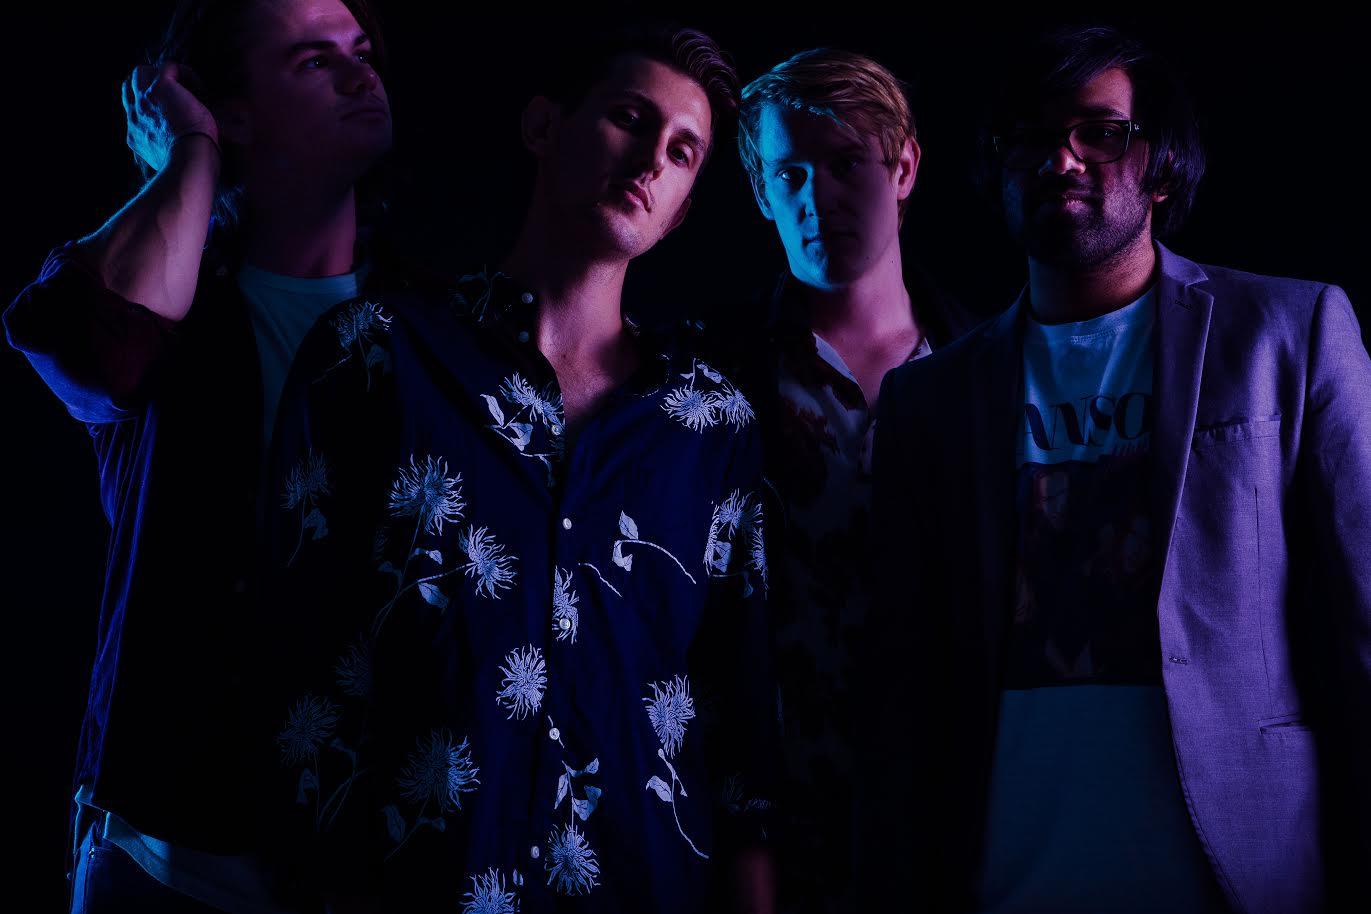 Retro Culture (from left to right) Matthew Hives (drums), Matt Connelly (vocals/keys), Matt Phillips (guitar), Daniel Boca-Vista (bass/keys)